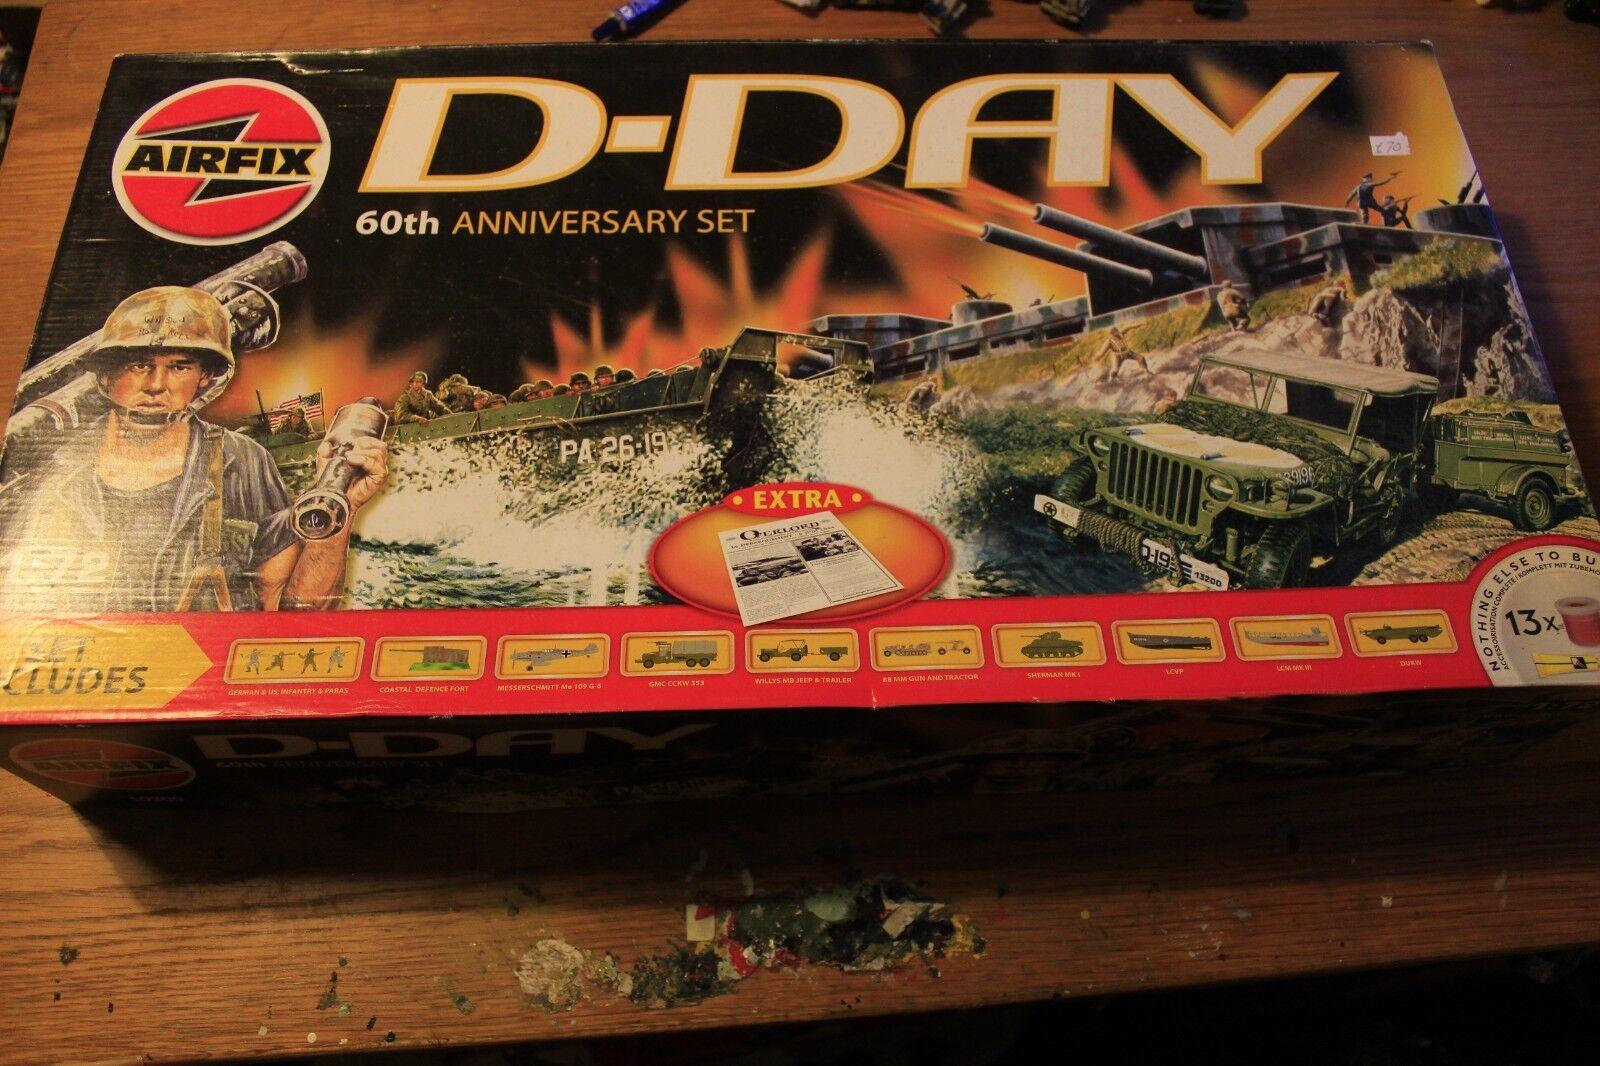 Airfix D-Day set 60th Anniversary 1 72 model kit